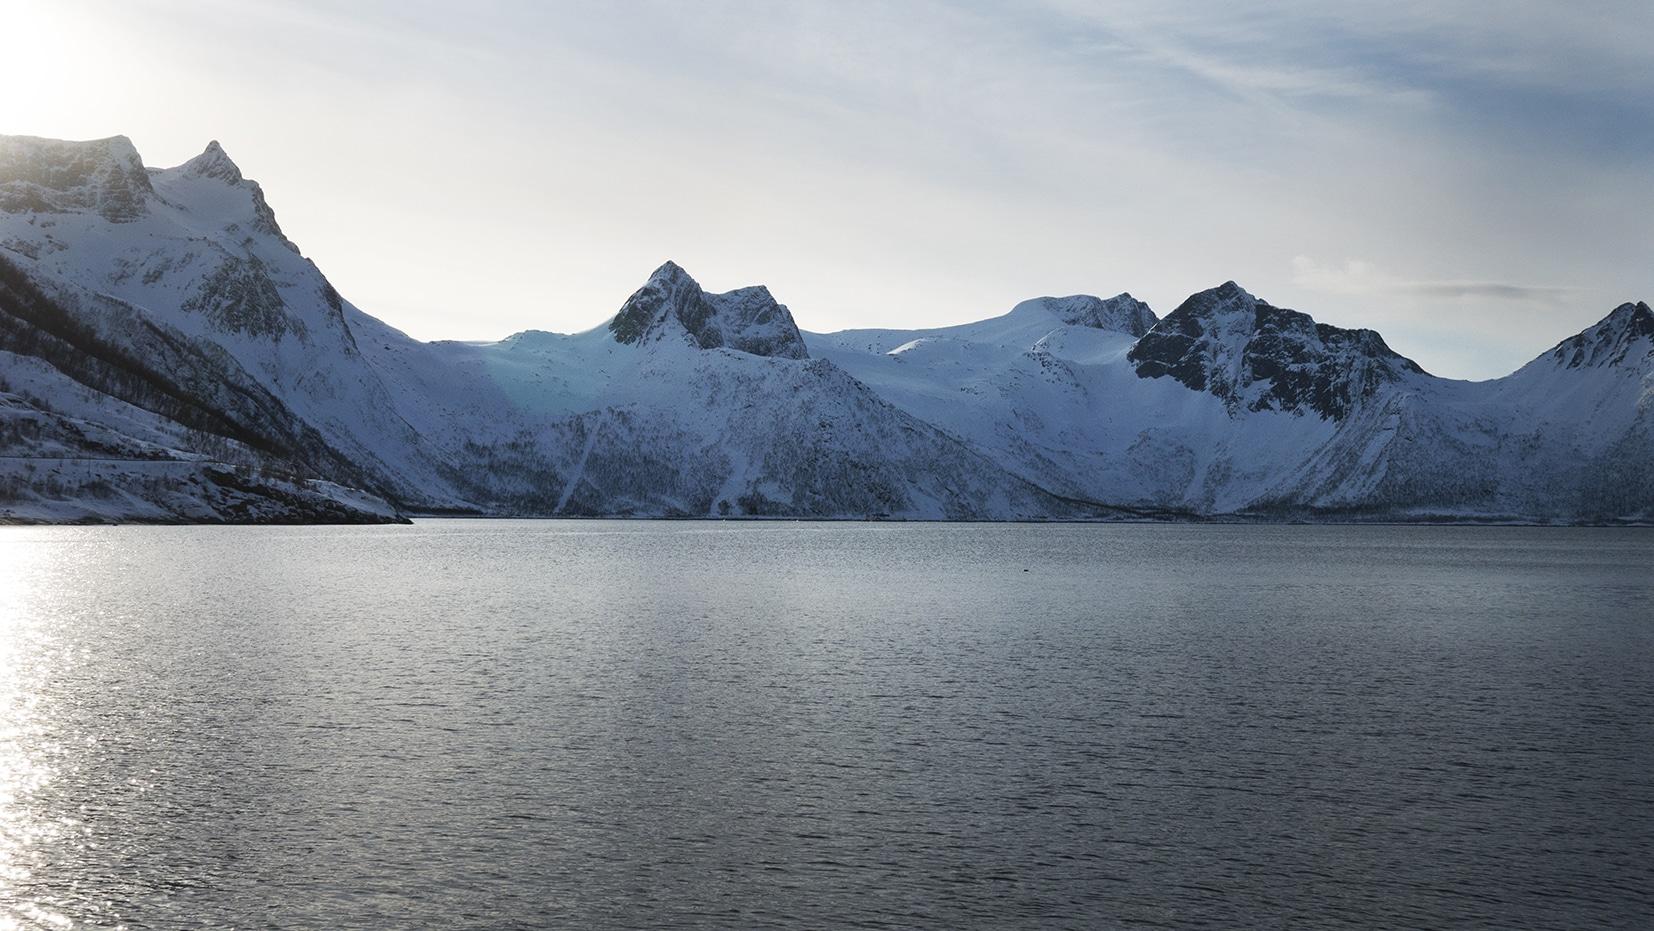 Mefjordbotn montagnes neige mer